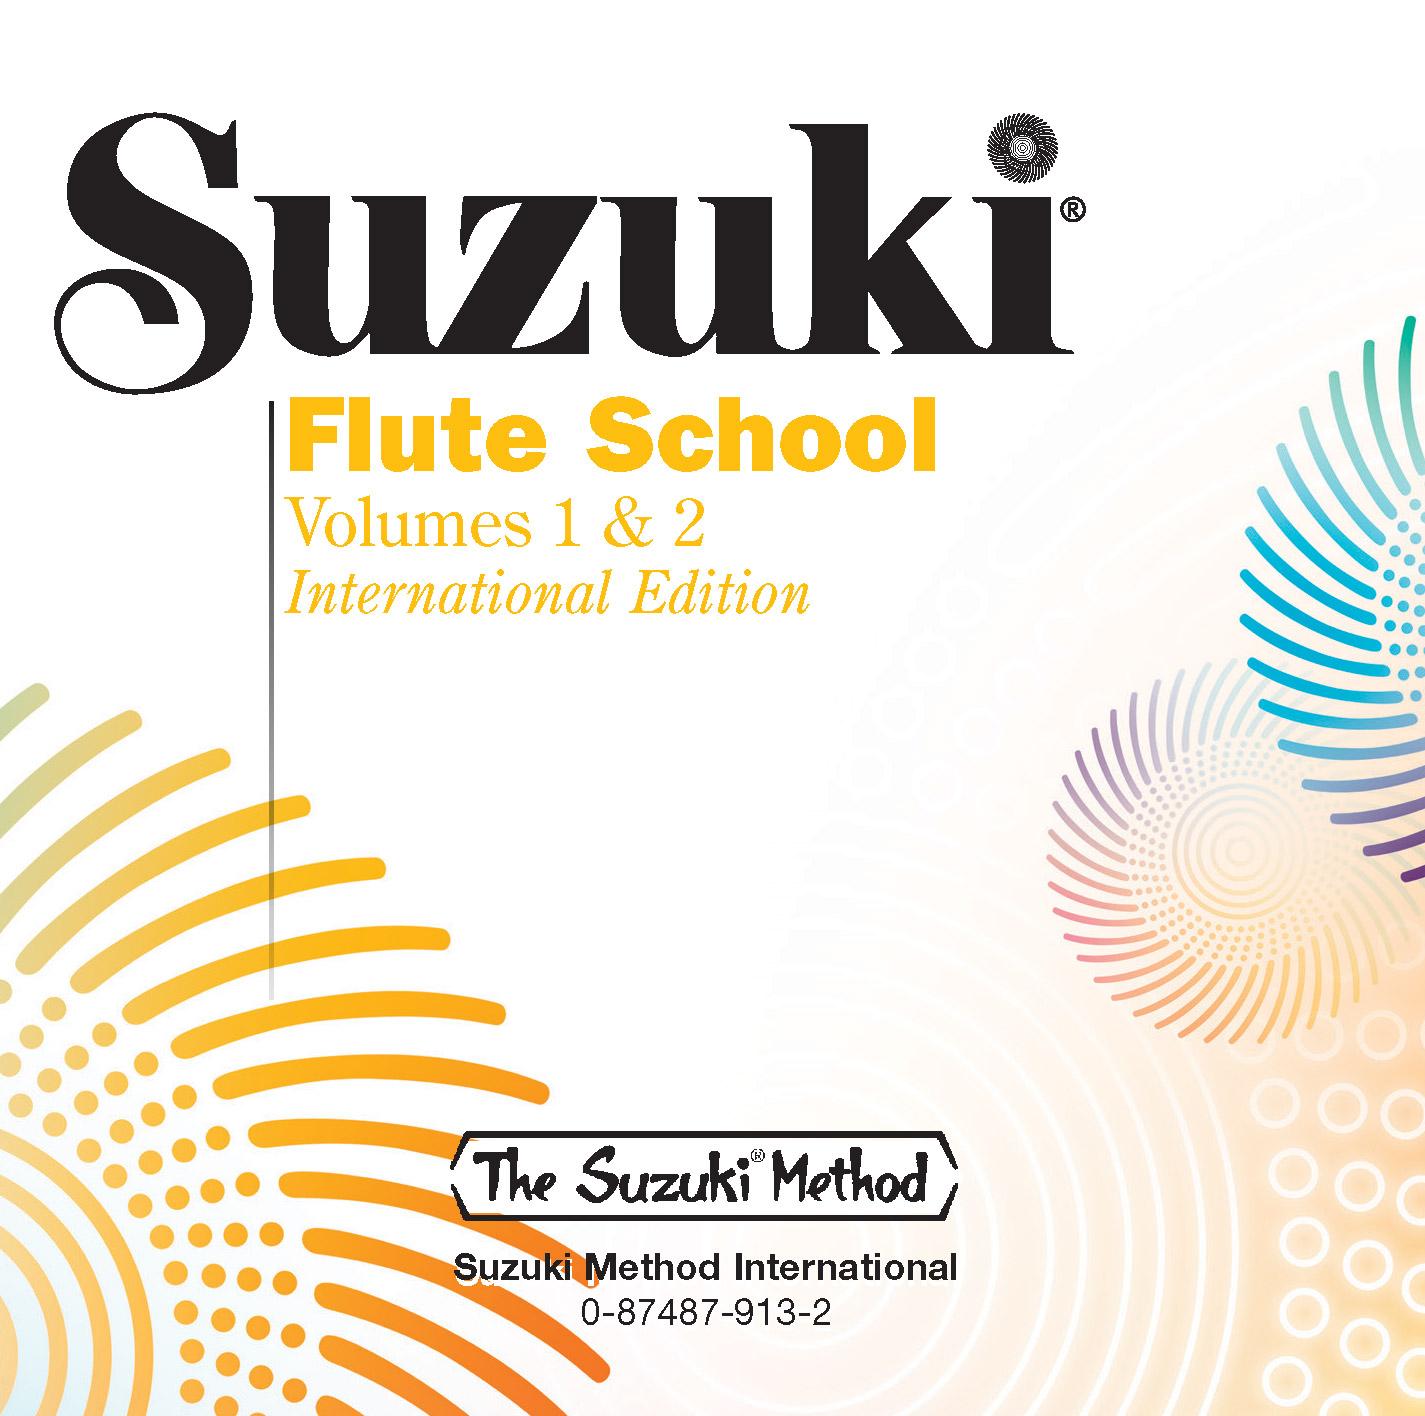 SUZUKI FLUTE SCHOOL 1 & 2 CD (0913 ) (Flute Methods )